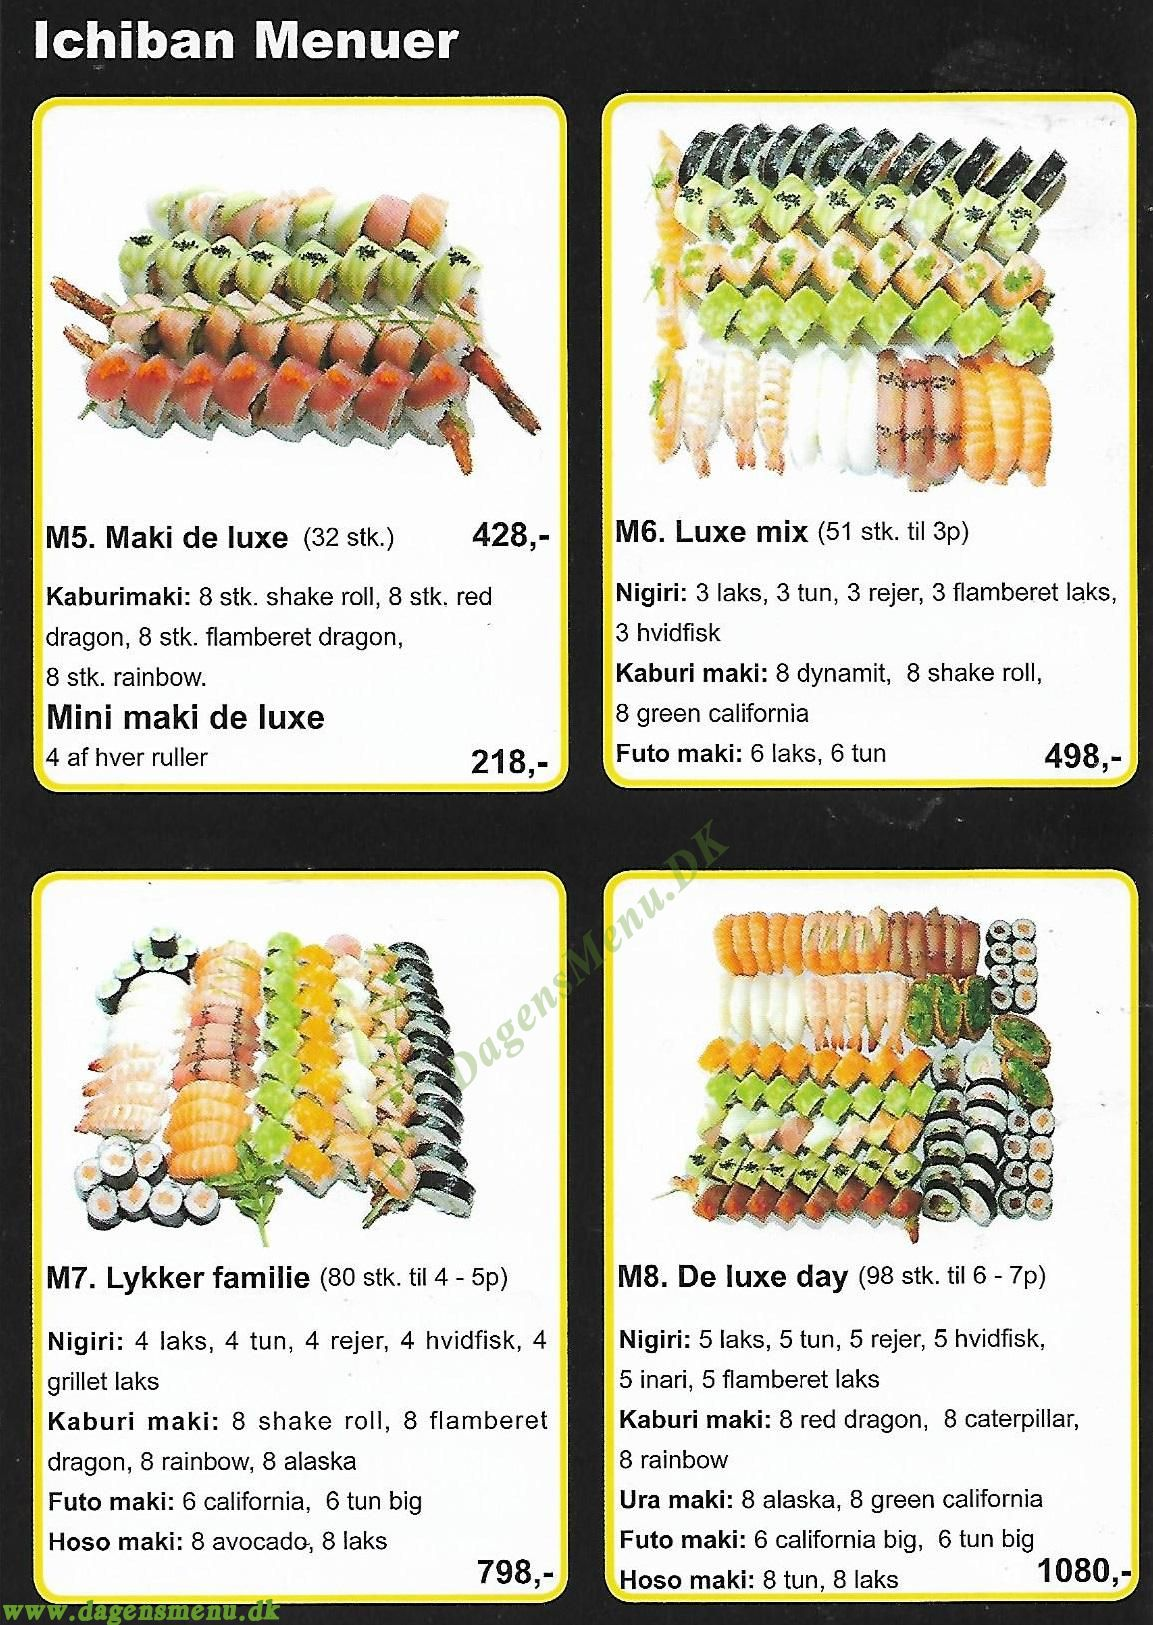 Ichiban Sushi - Menukort